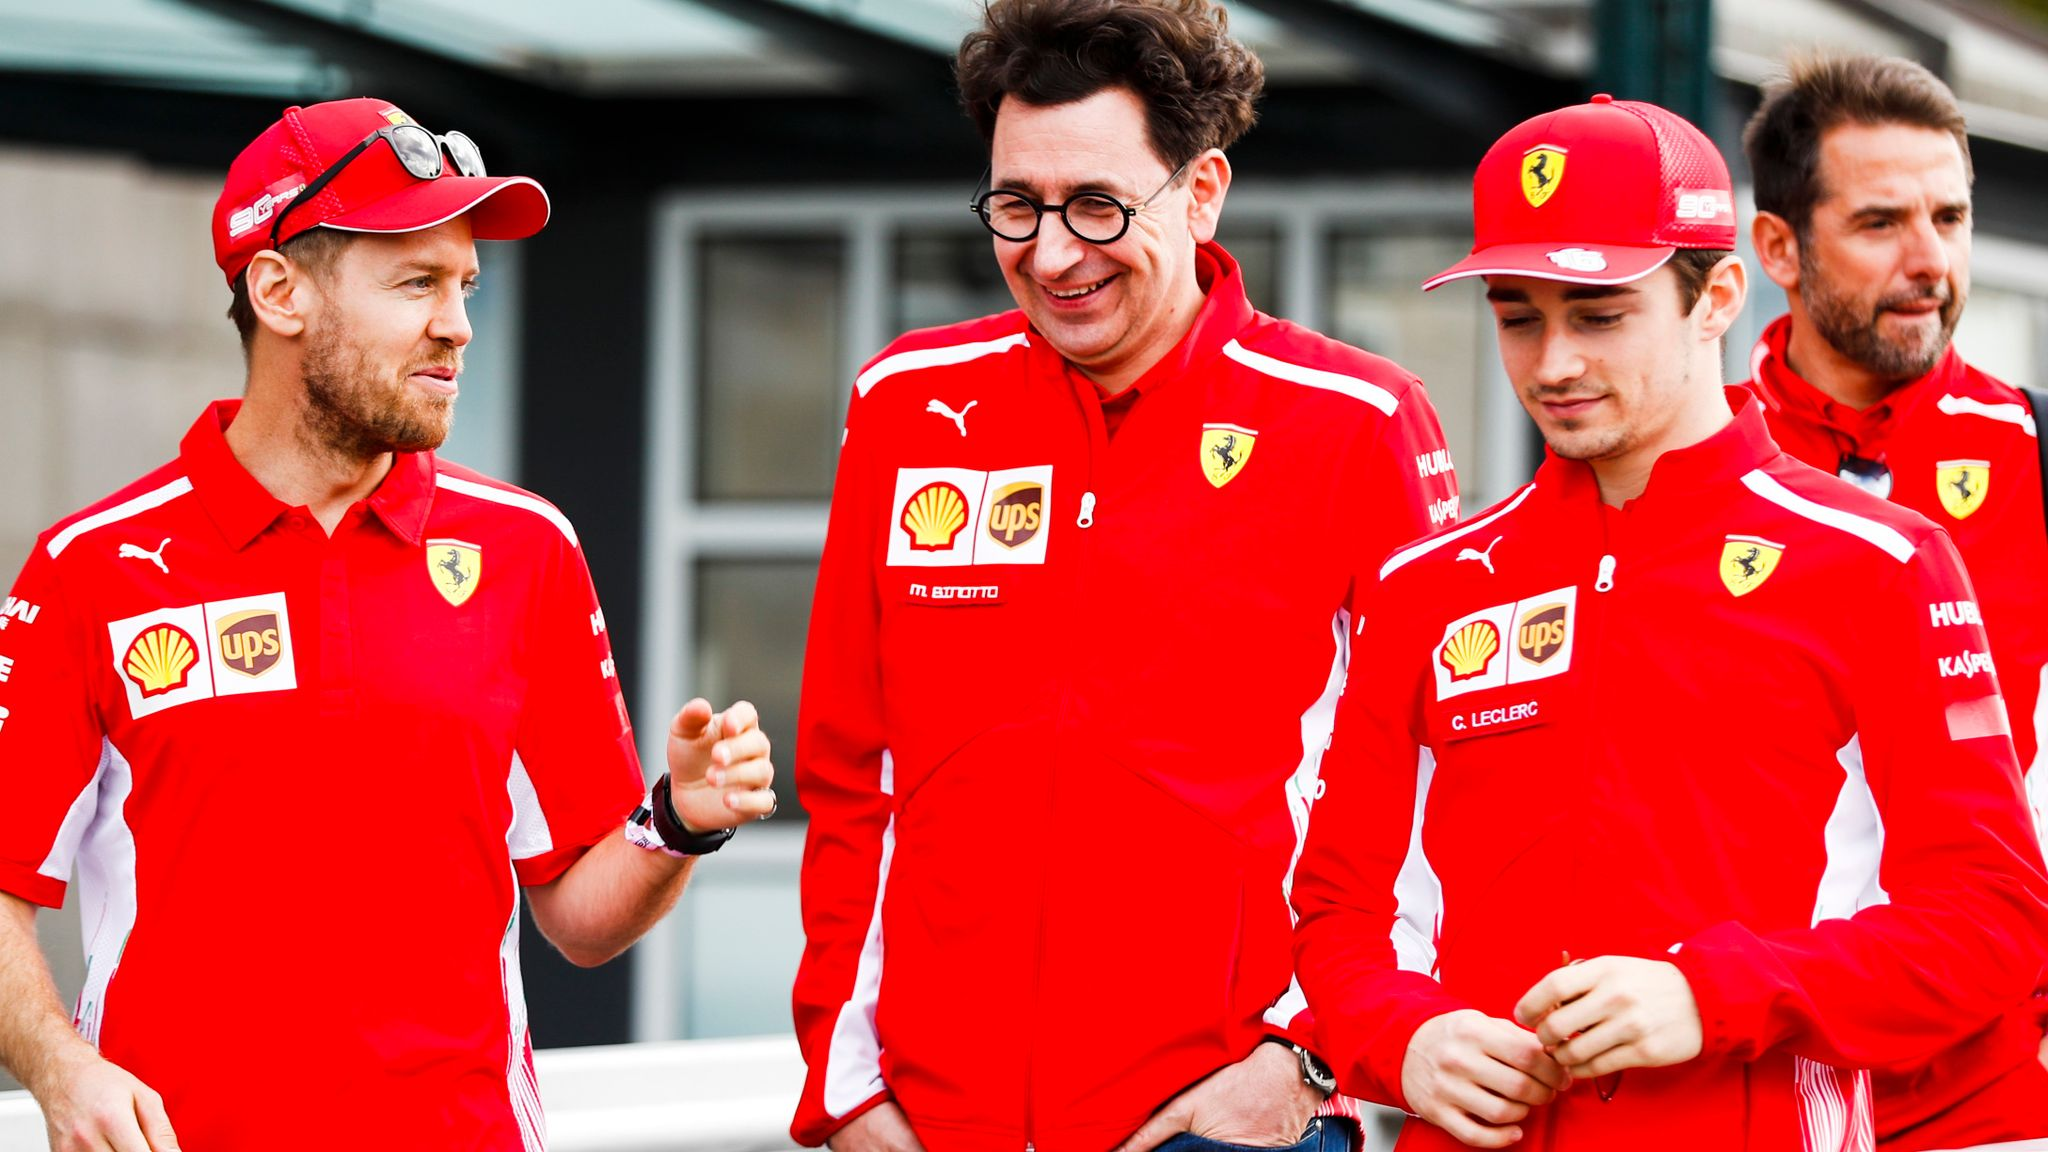 Ferrari 'lost' title battle to Mercedes when designing Formula 1 2019 car